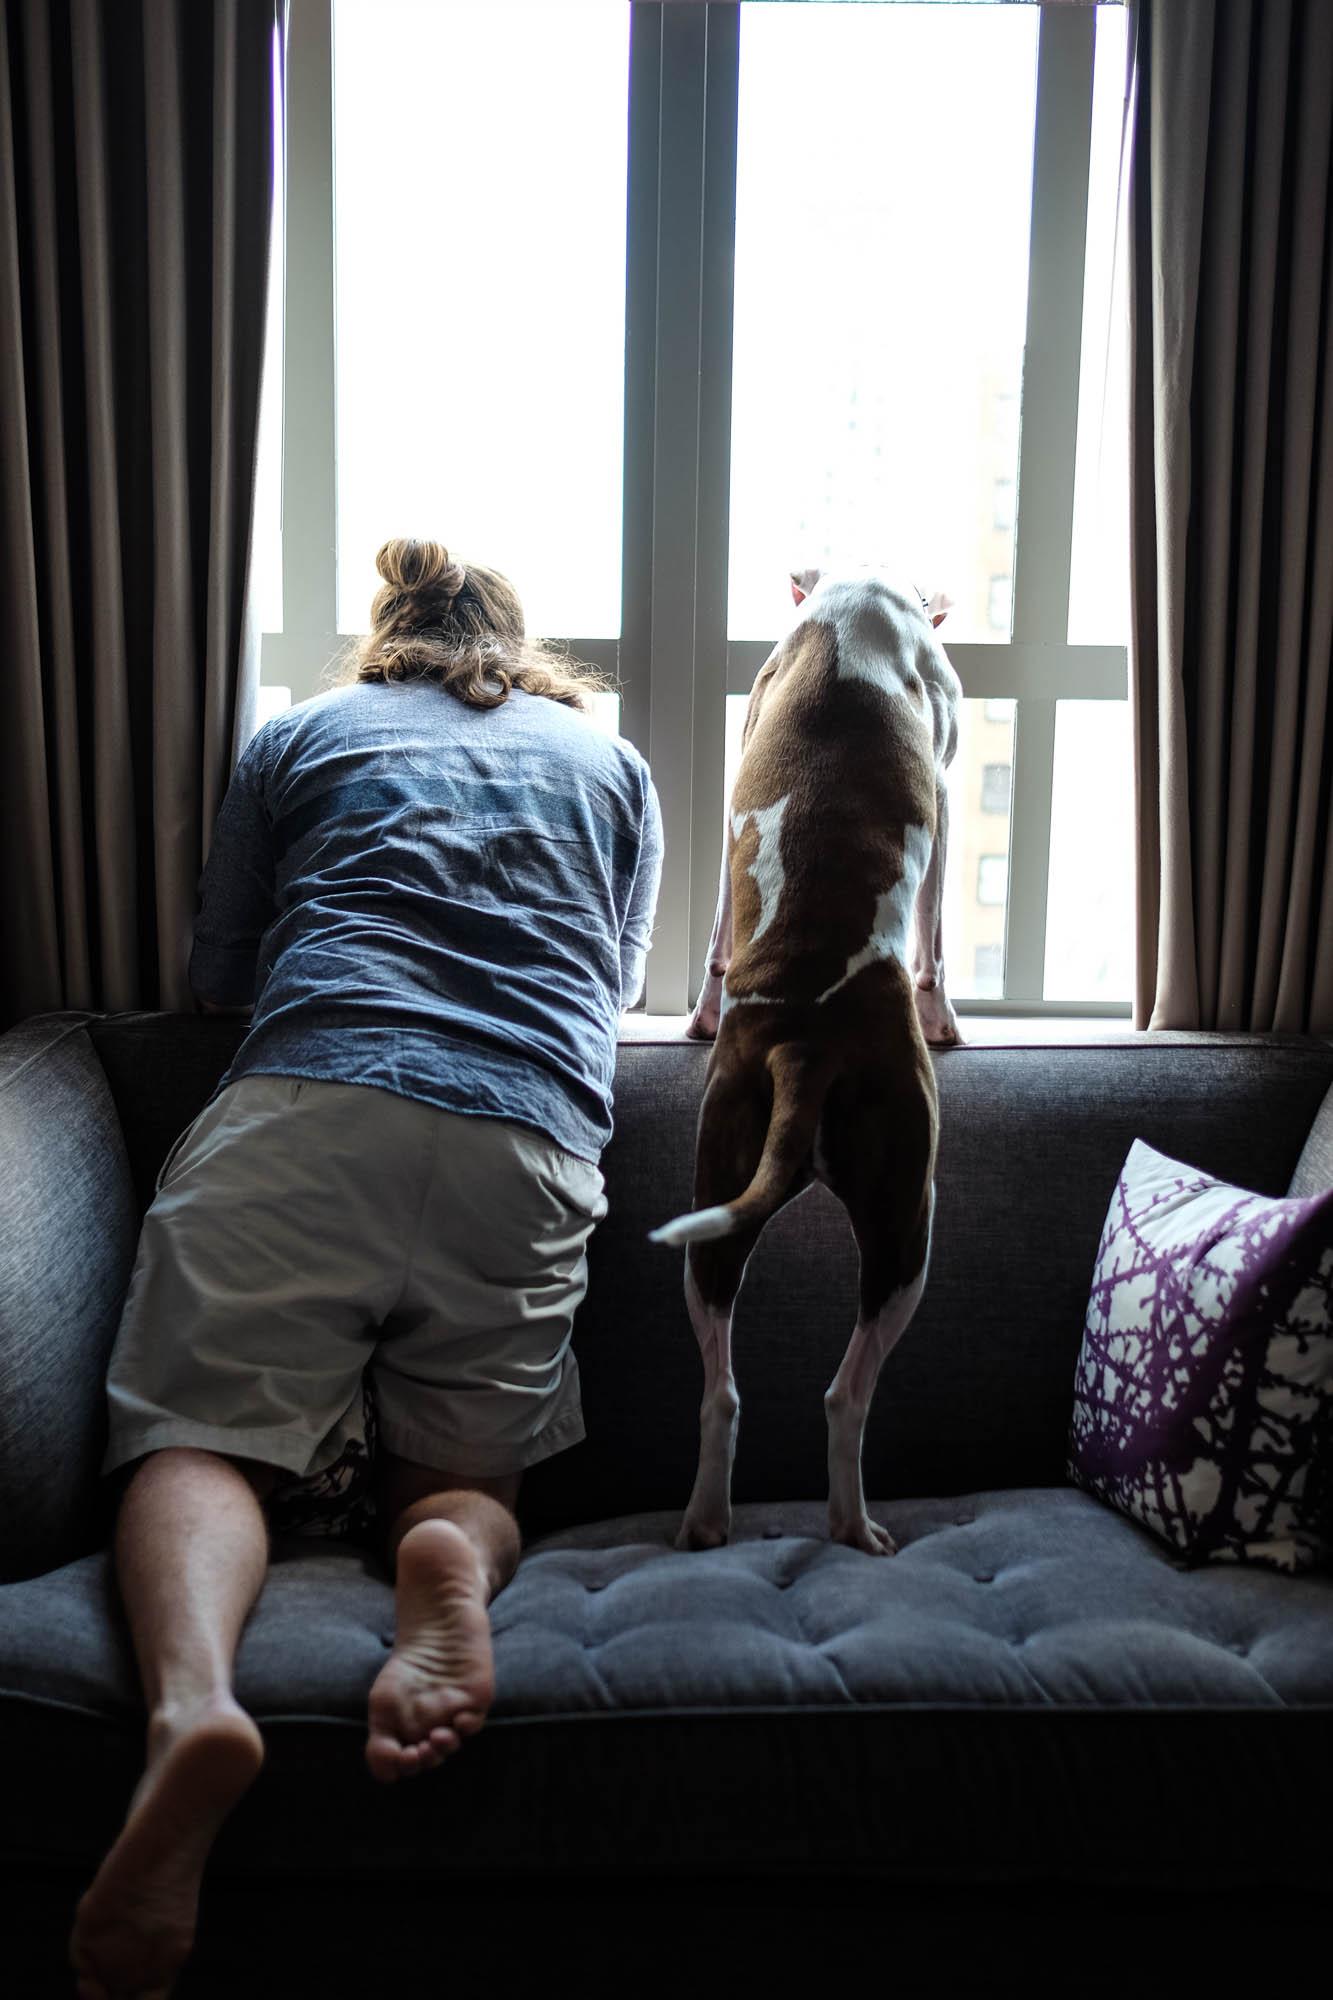 Kimpton_Palomar_Dog_Friendly_Hotel_Philadelphia_Photographer_Kristen_Humbert_1